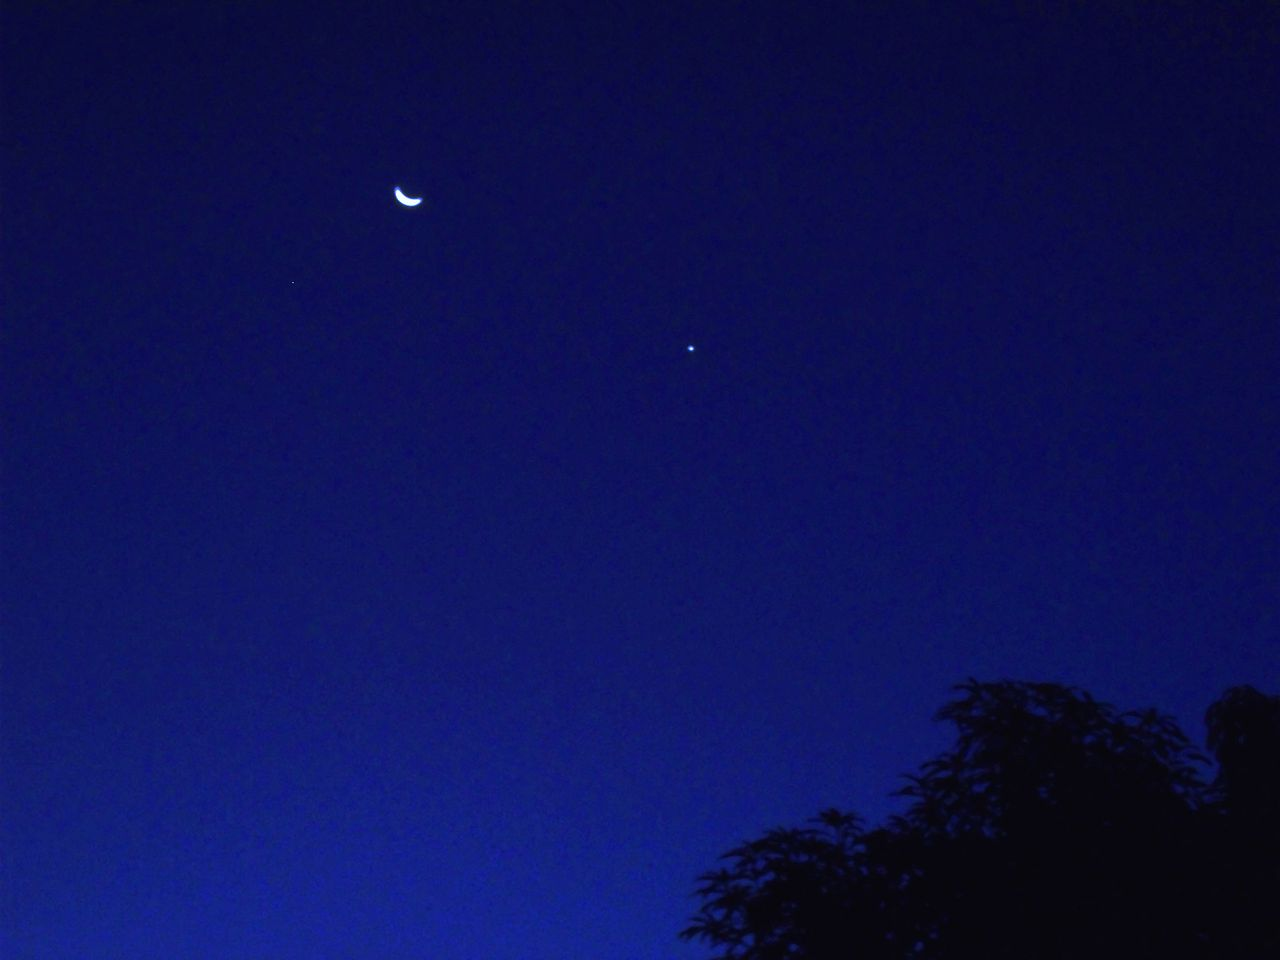 File:Conjunção Tripla entre Lua, Vênus e Aldebaran JPG